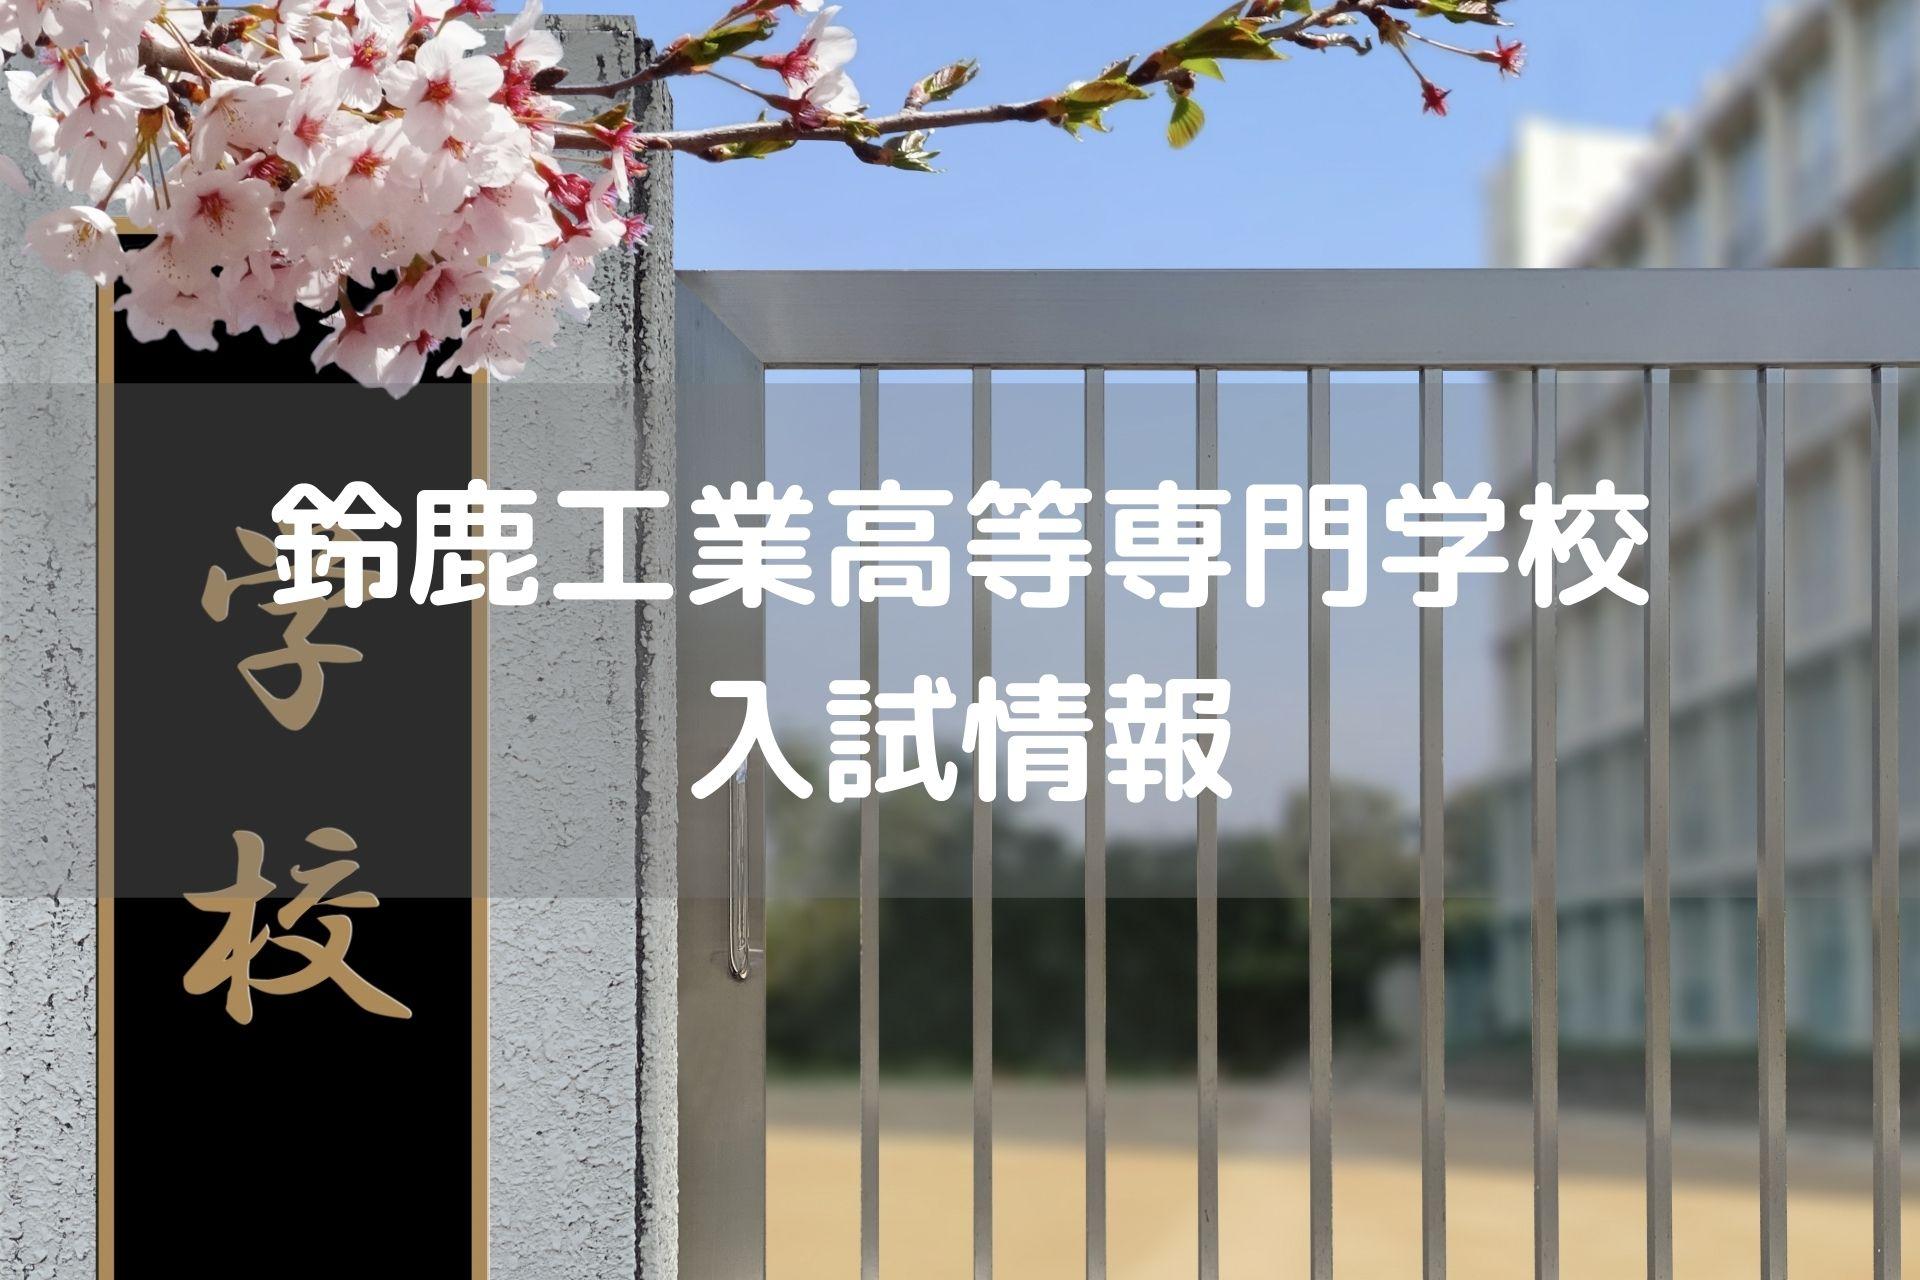 鈴鹿高専の入試情報